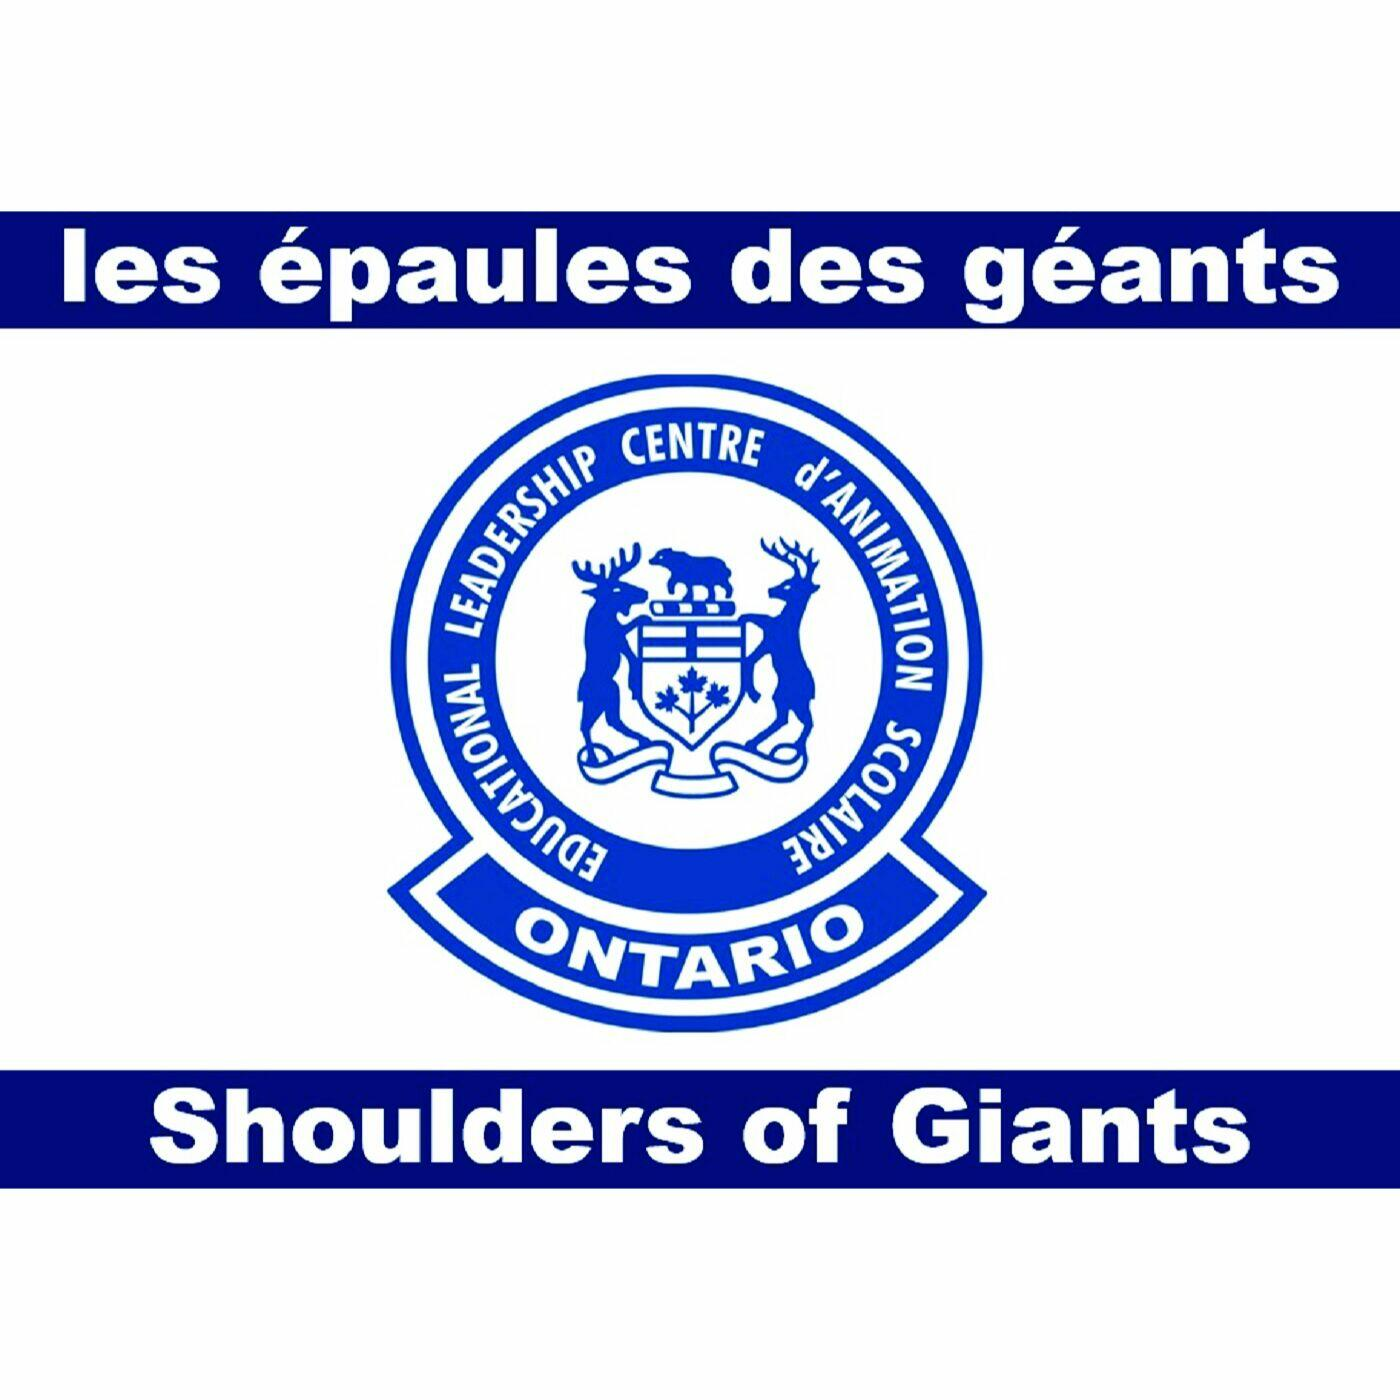 OELC CASO: Shoulders of Giants